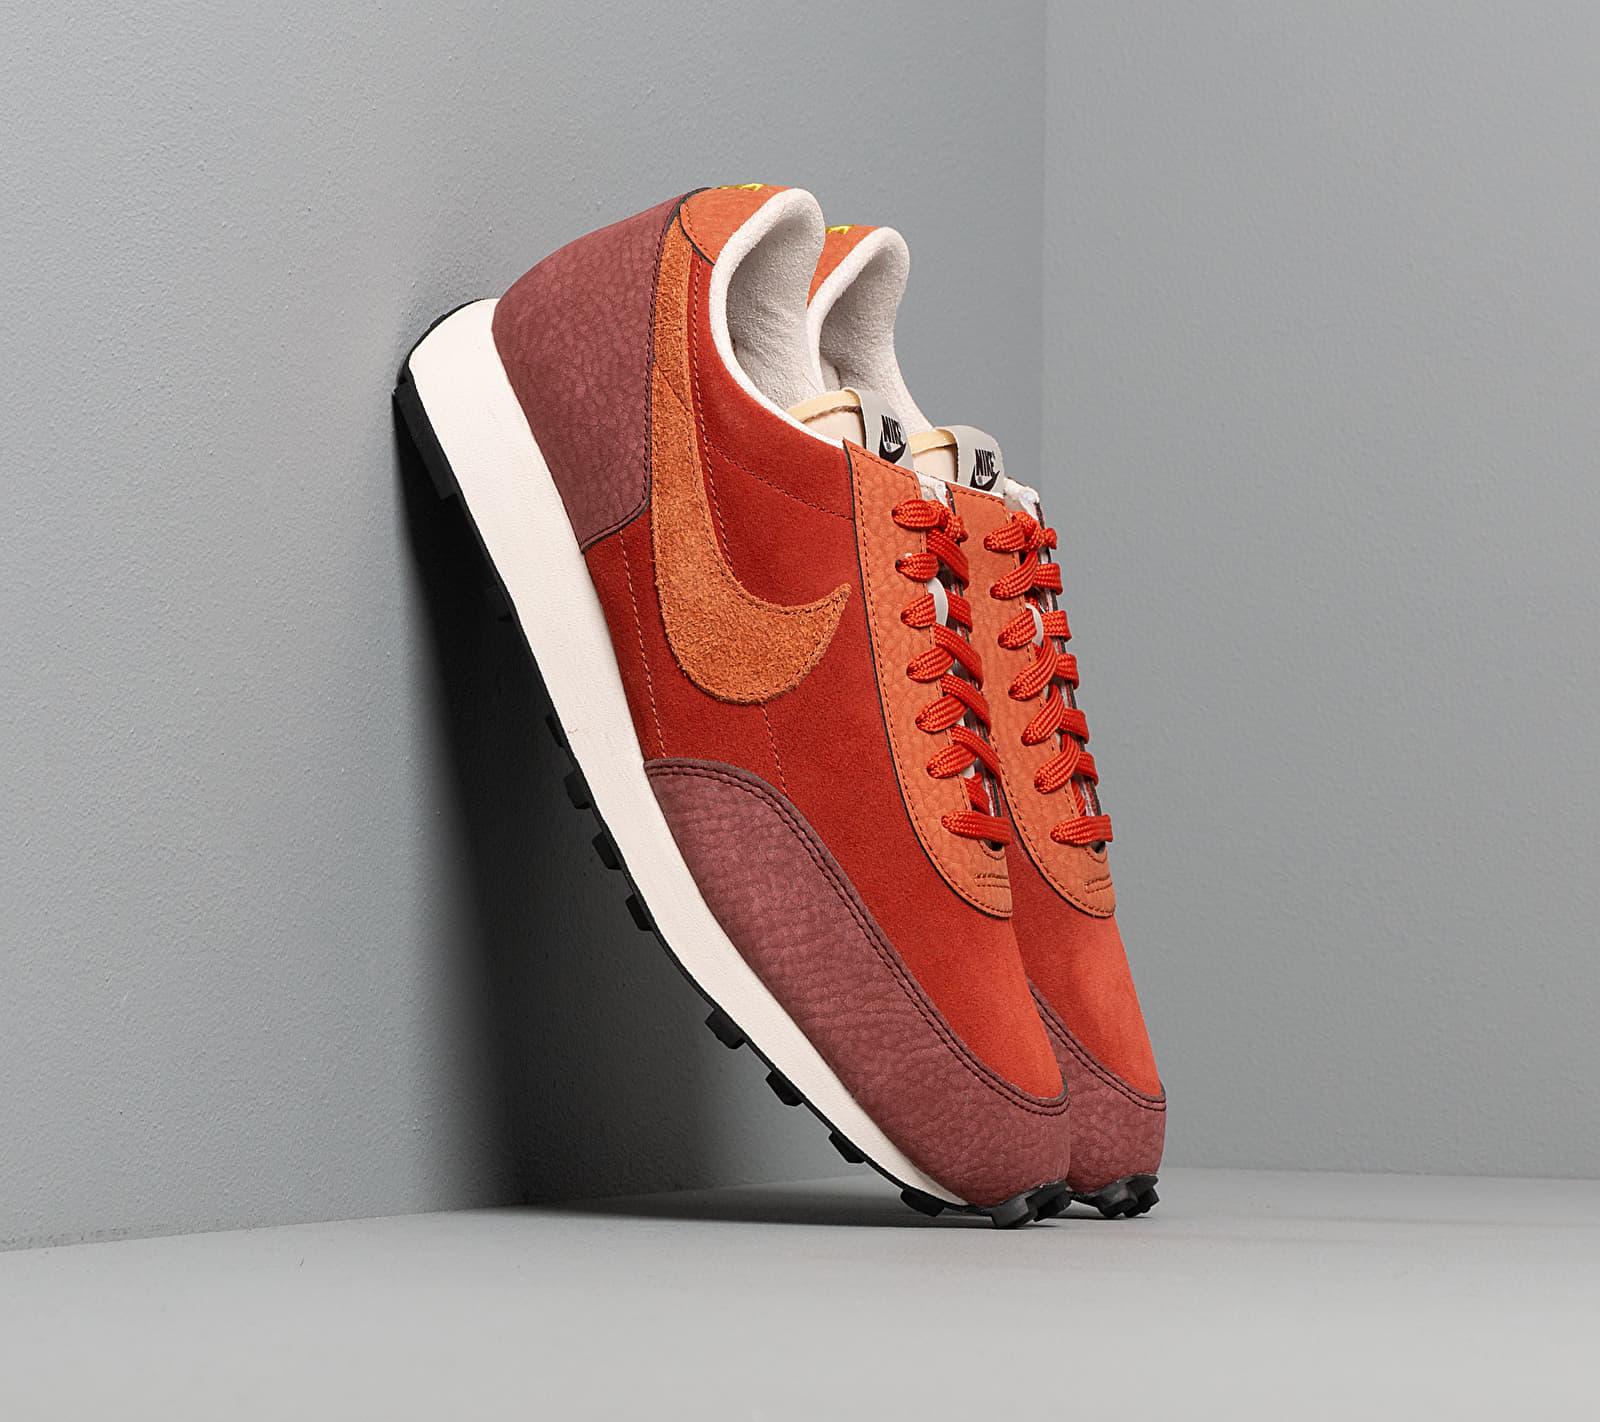 Nike Daybreak Rugged Orange/ Desert Orange-Pueblo Brown CU3016-800